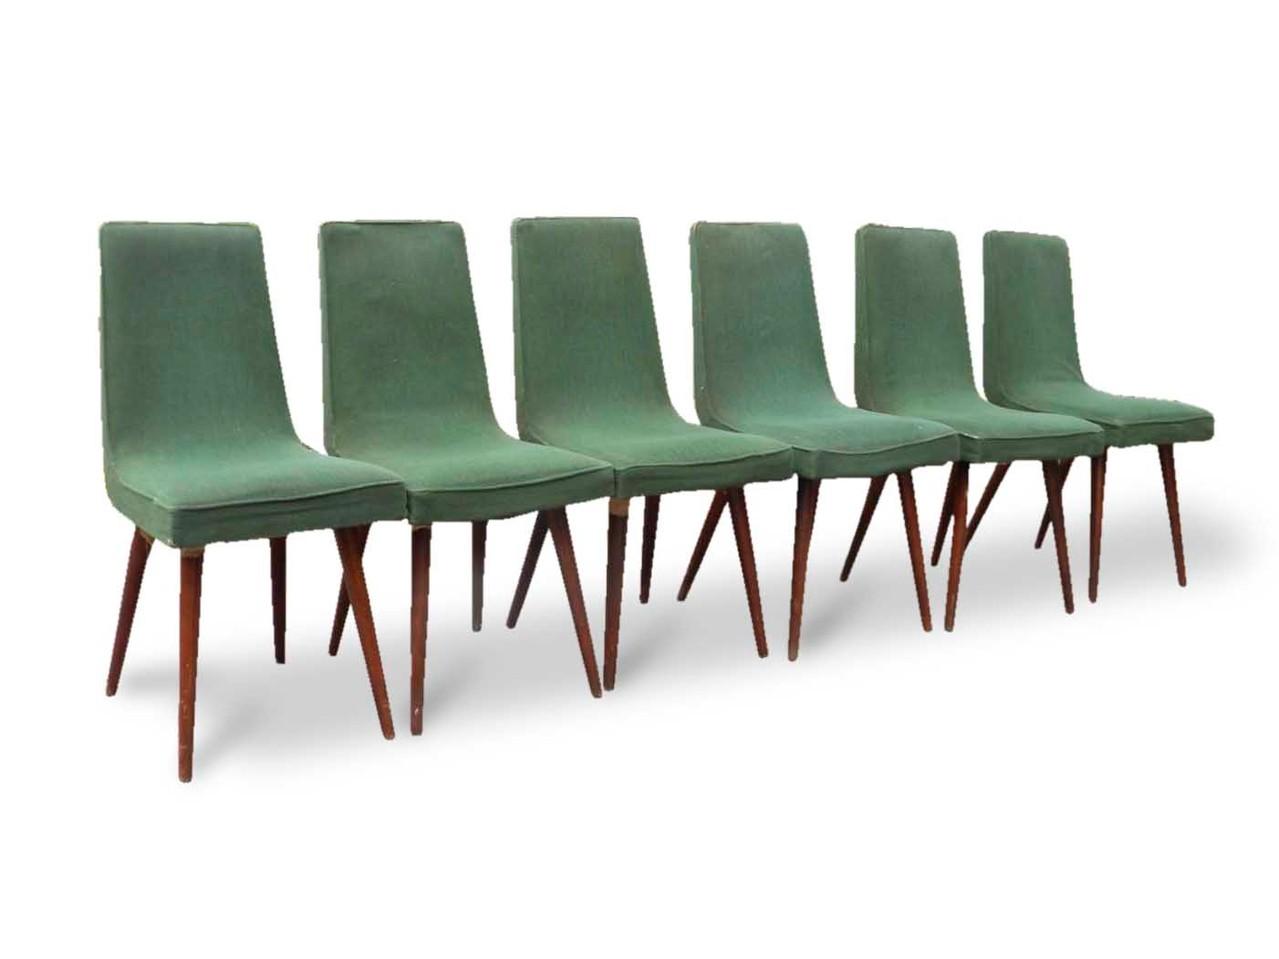 Sedie Vintage Anni 50 : Sedie vintage anni italian vintage sofa